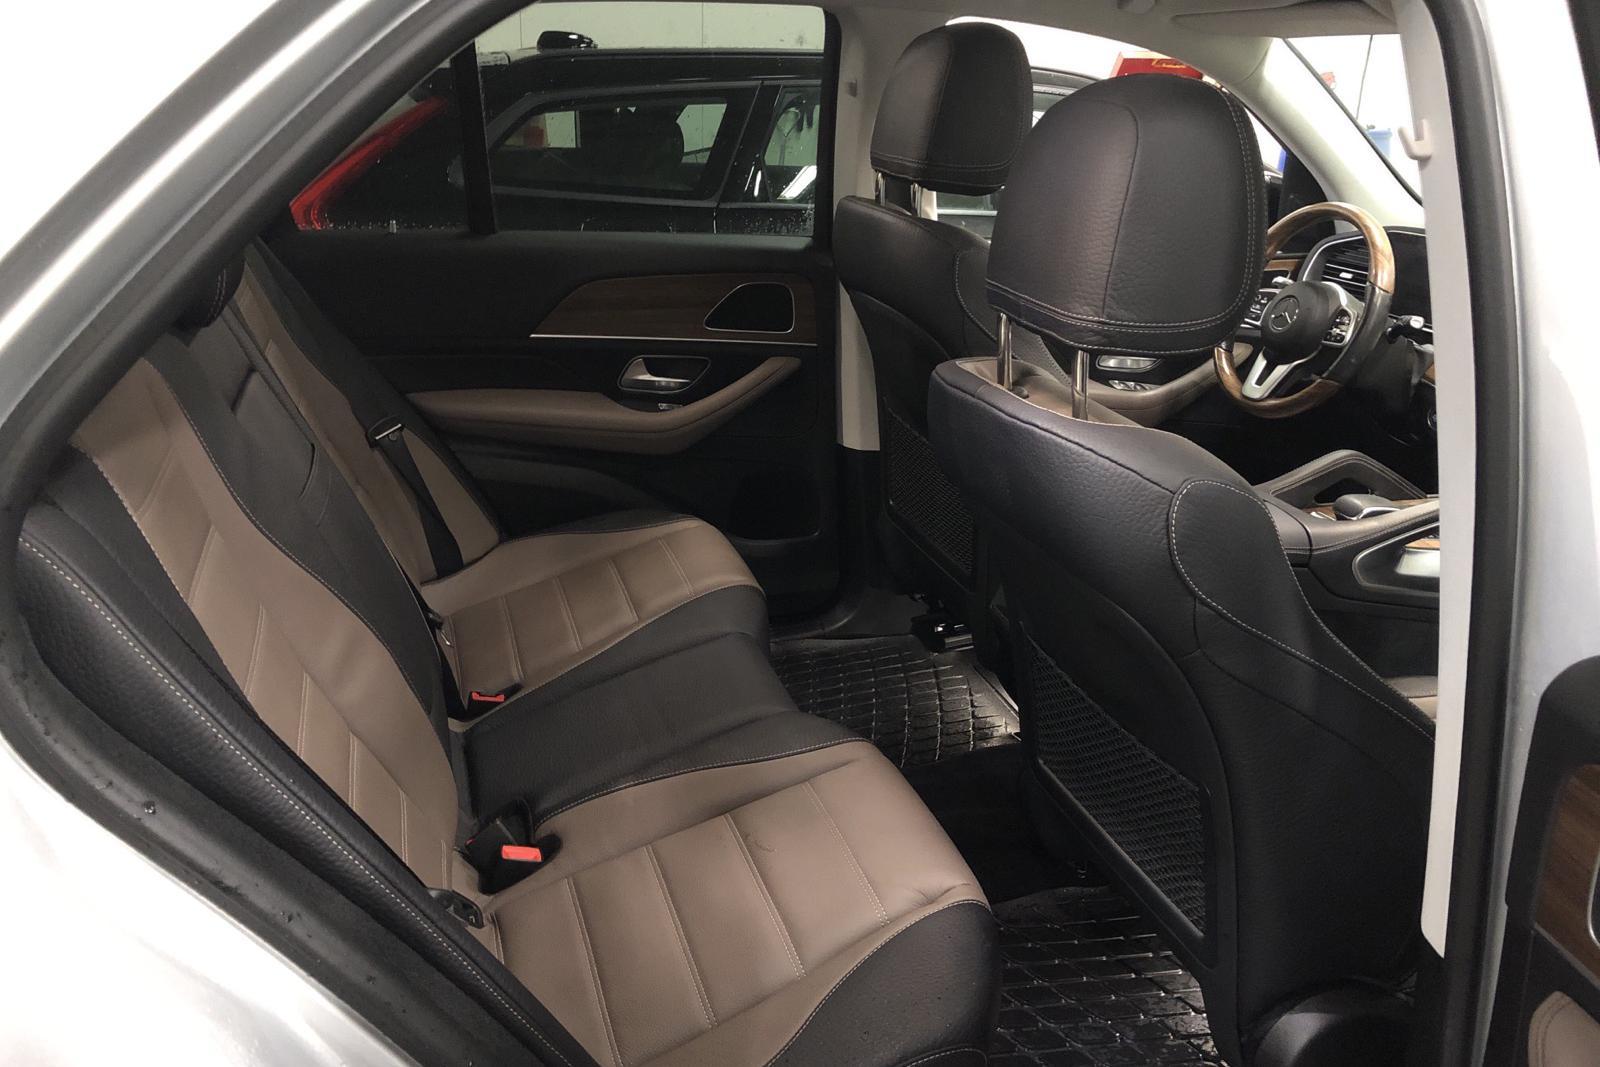 Mercedes GLE 400 d 4MATIC V167 (330hk) - 43 980 km - Automatic - silver - 2020